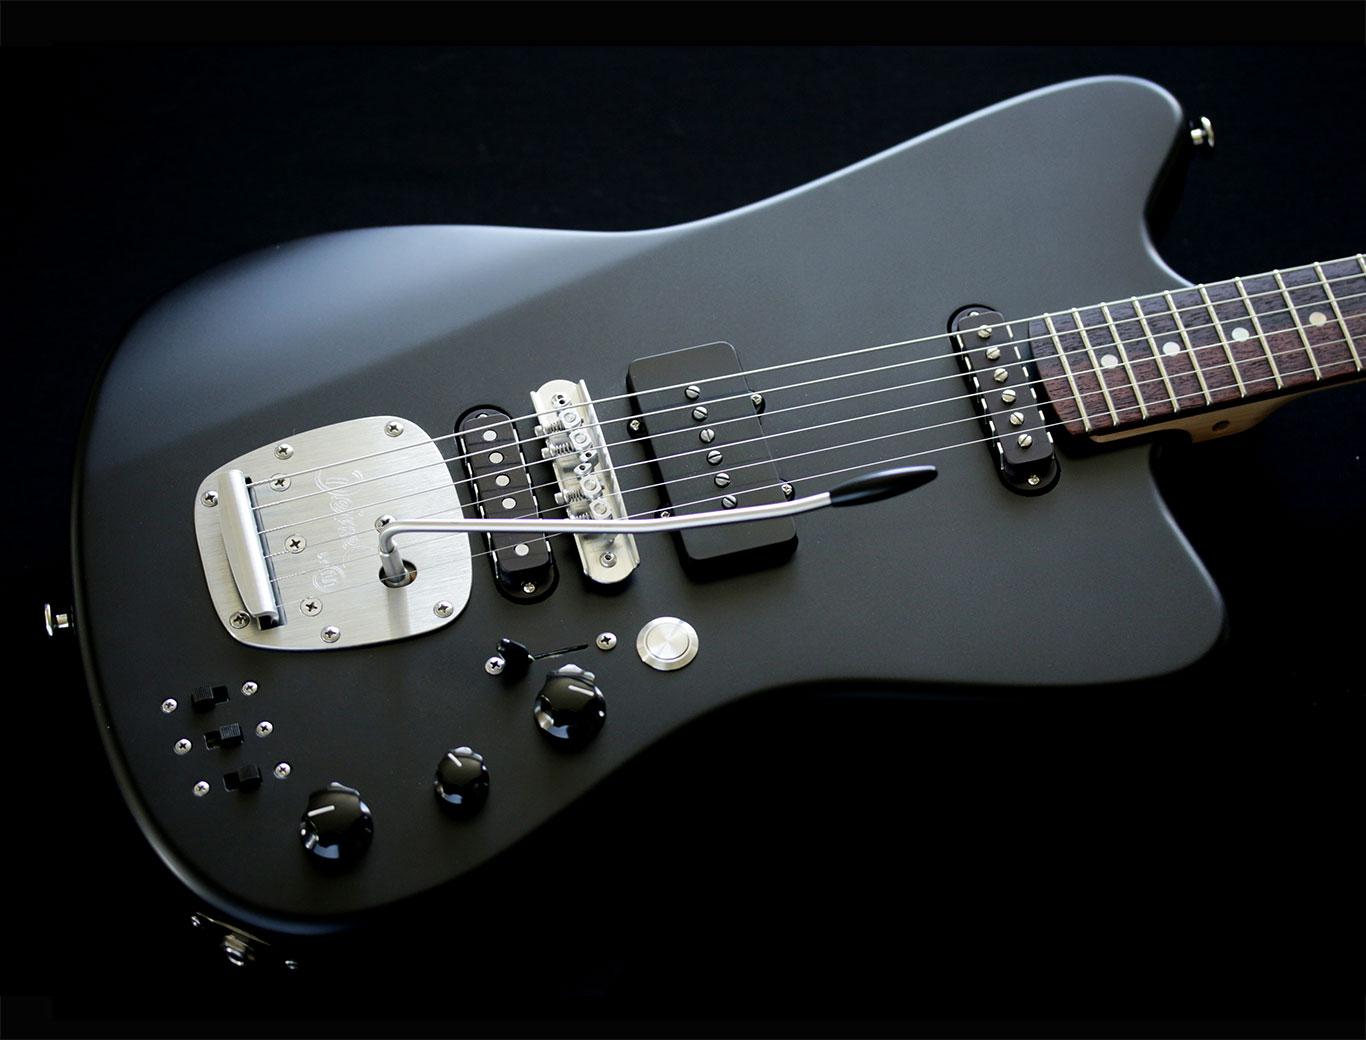 Deimel Guitarworks – Guitars & Basses